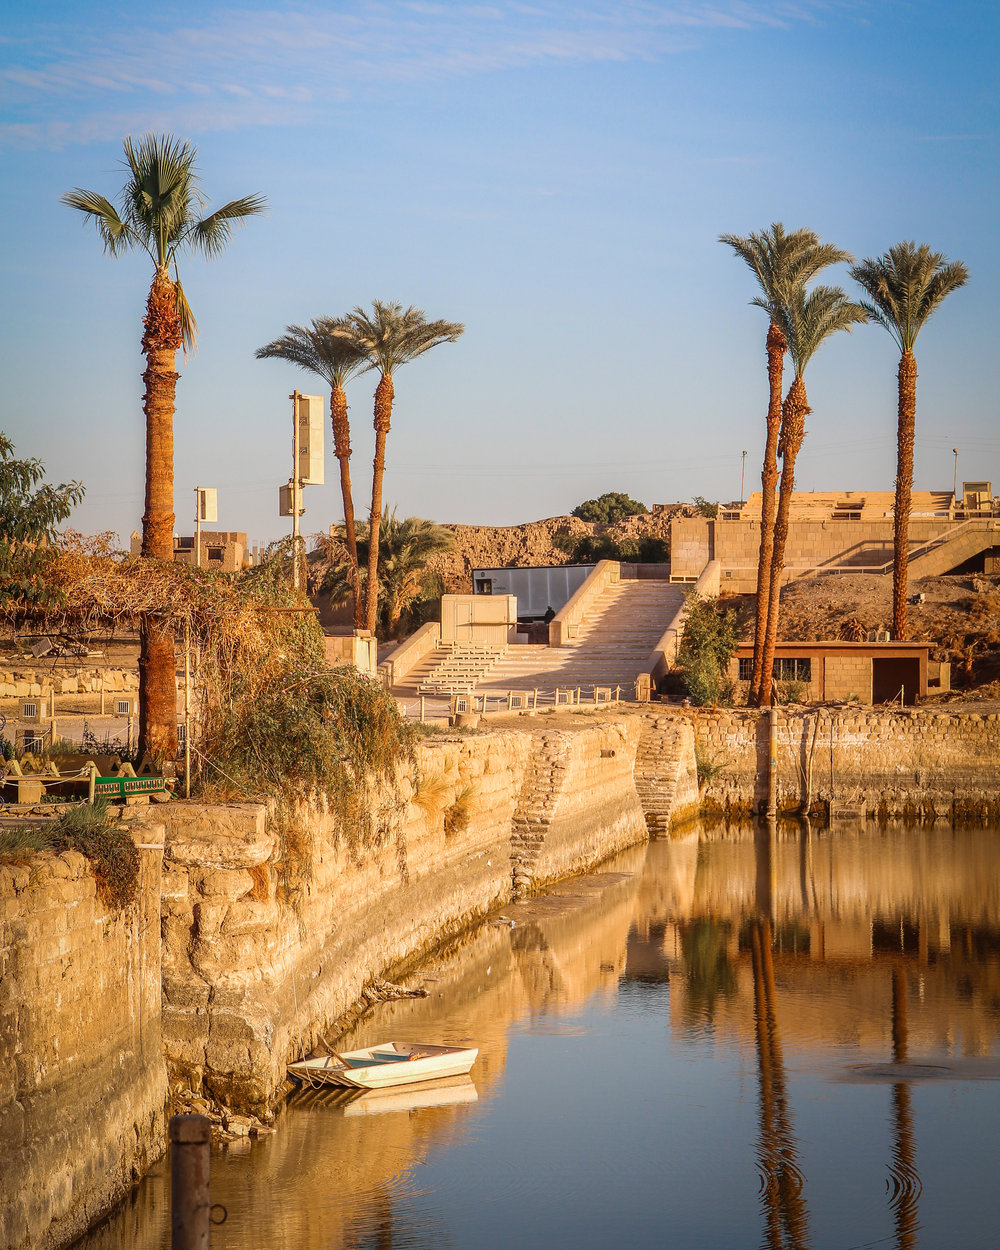 withkidsontheroad_desert__Luxor-4w.jpg